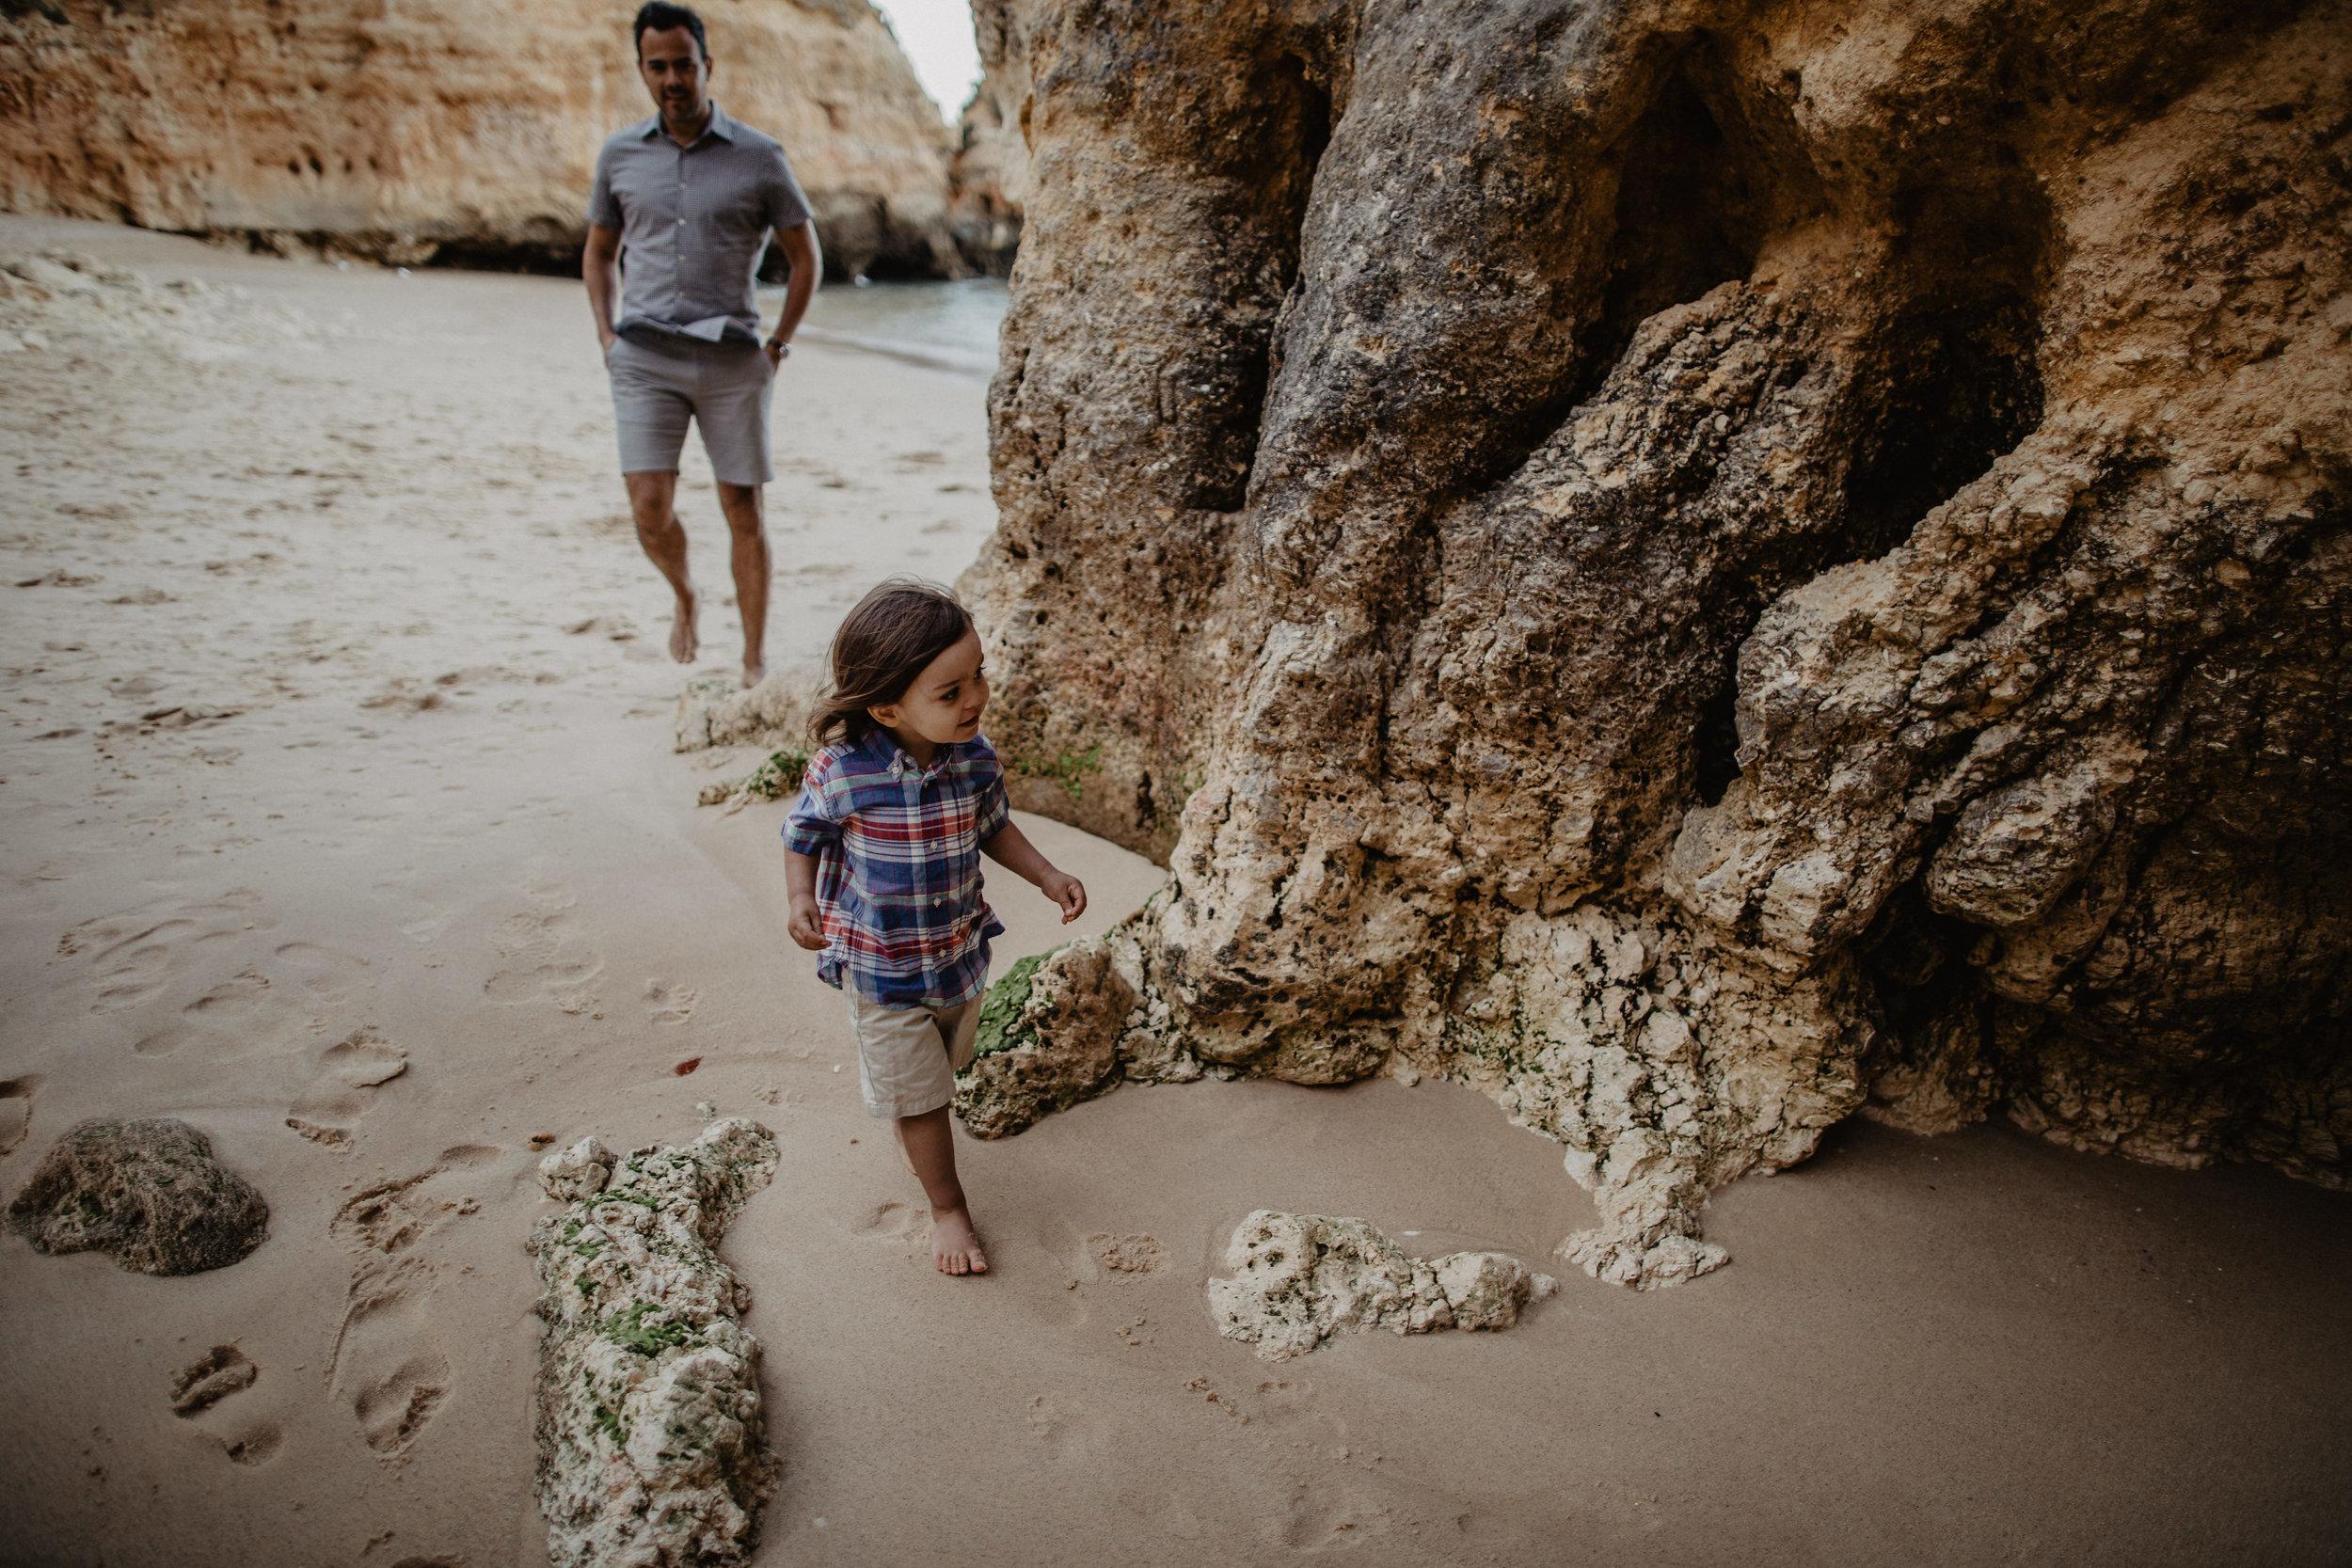 Lapela-Family-photography-Lagos-Algarve36.jpg